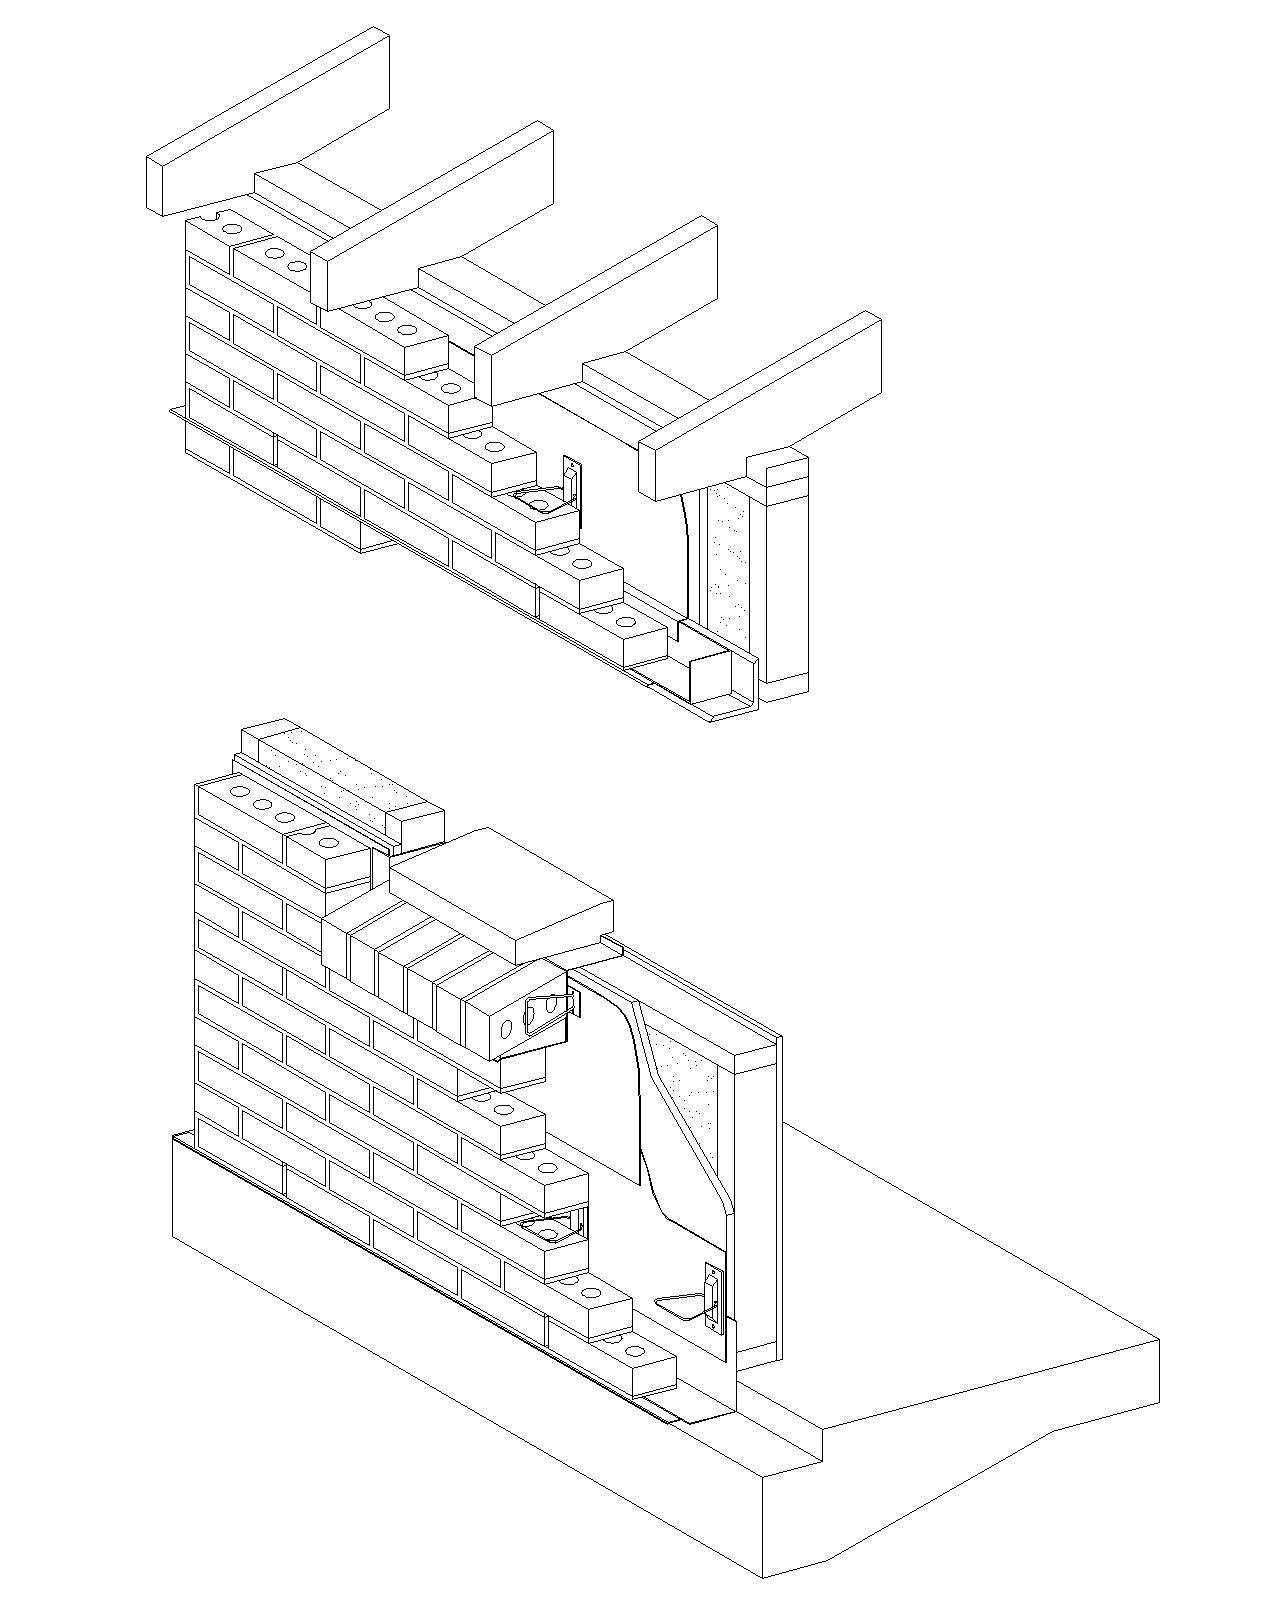 Brick Building Drawing At Getdrawings